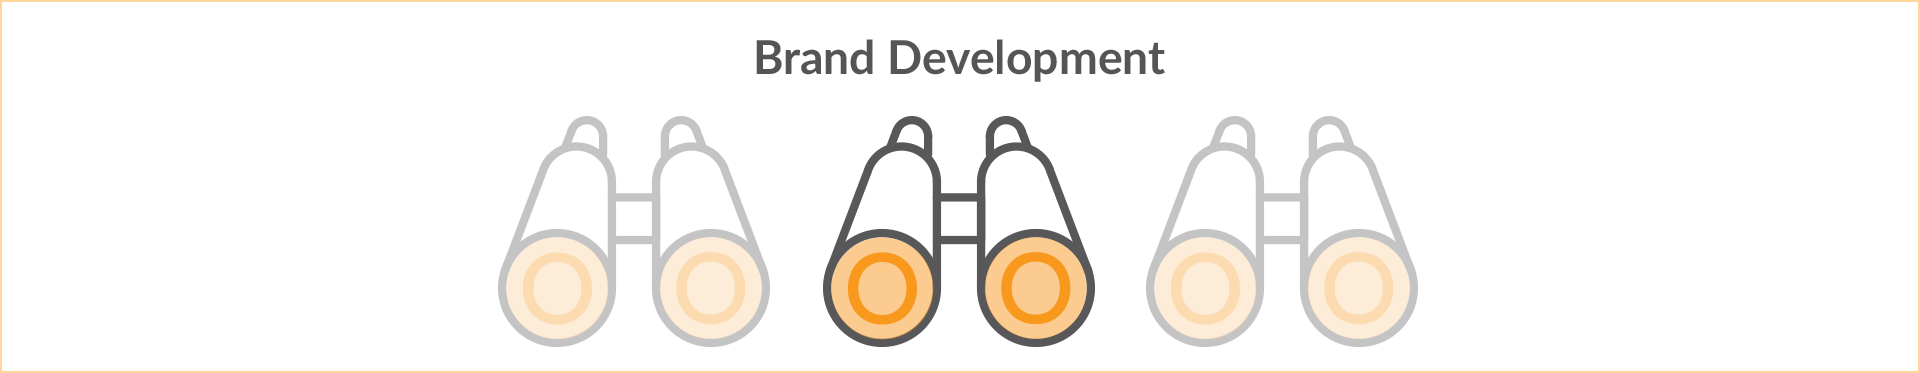 brand development title with three binocular icons